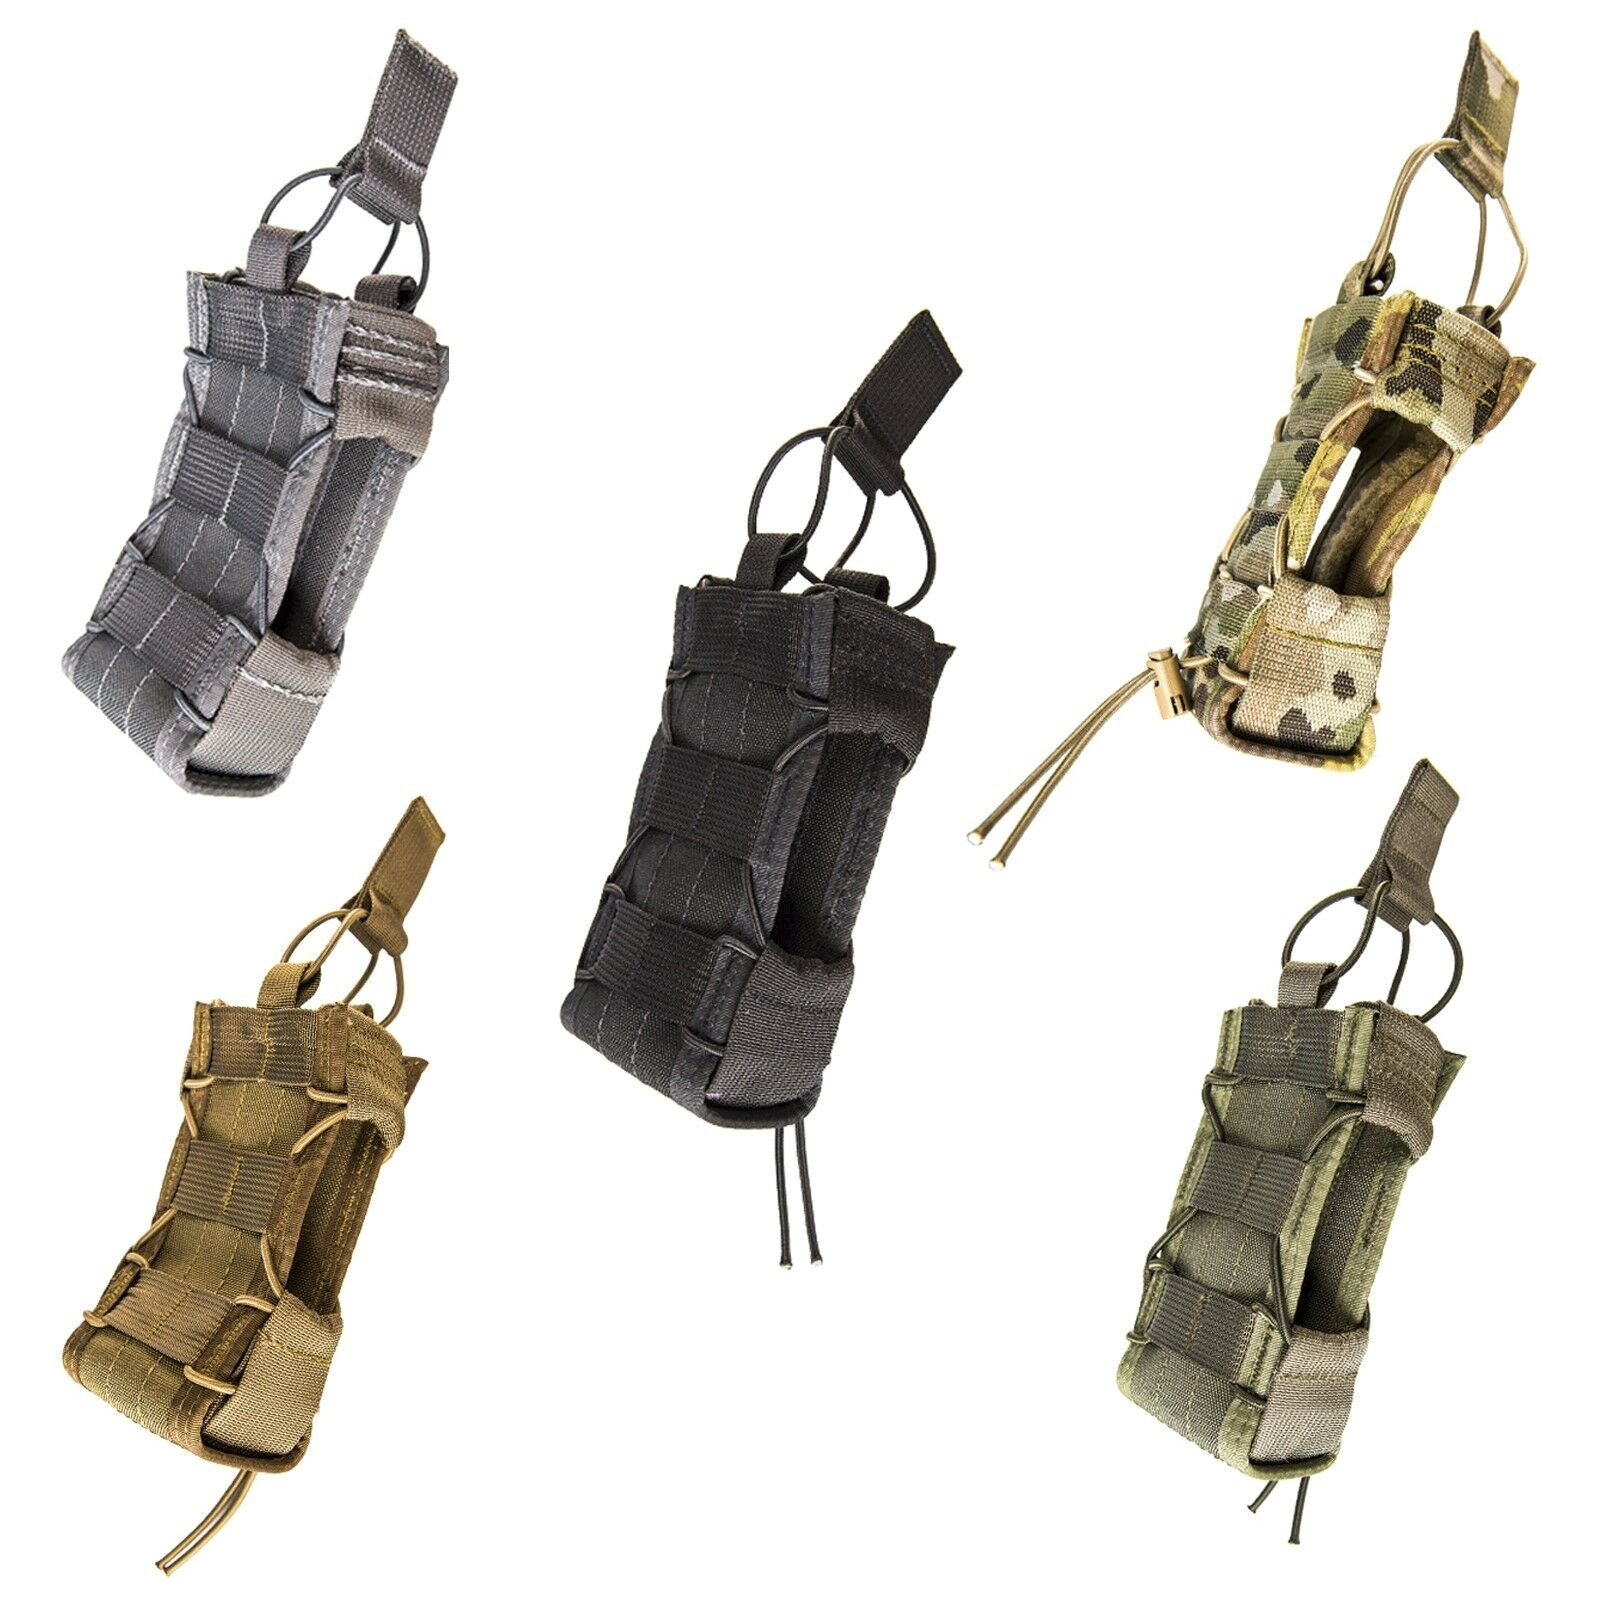 hsgi 13mac belt mounted open top multi access comm radio tool utility taco pouch